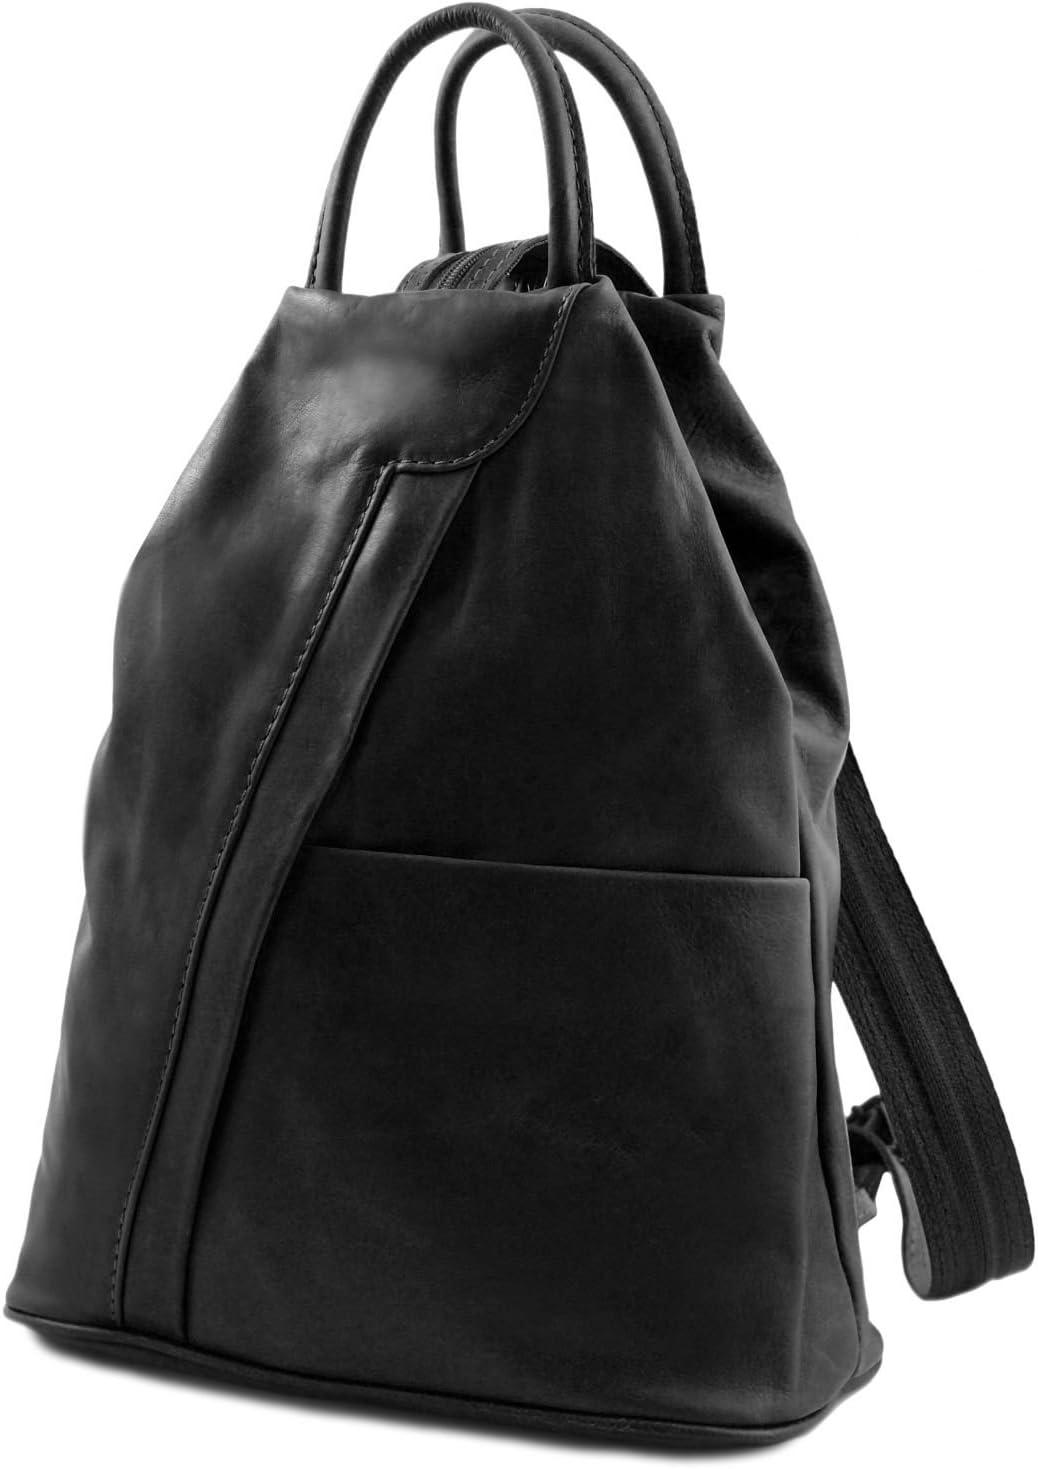 Shanghai Dark Blue TL140963 Tuscany Leather Leather backpack